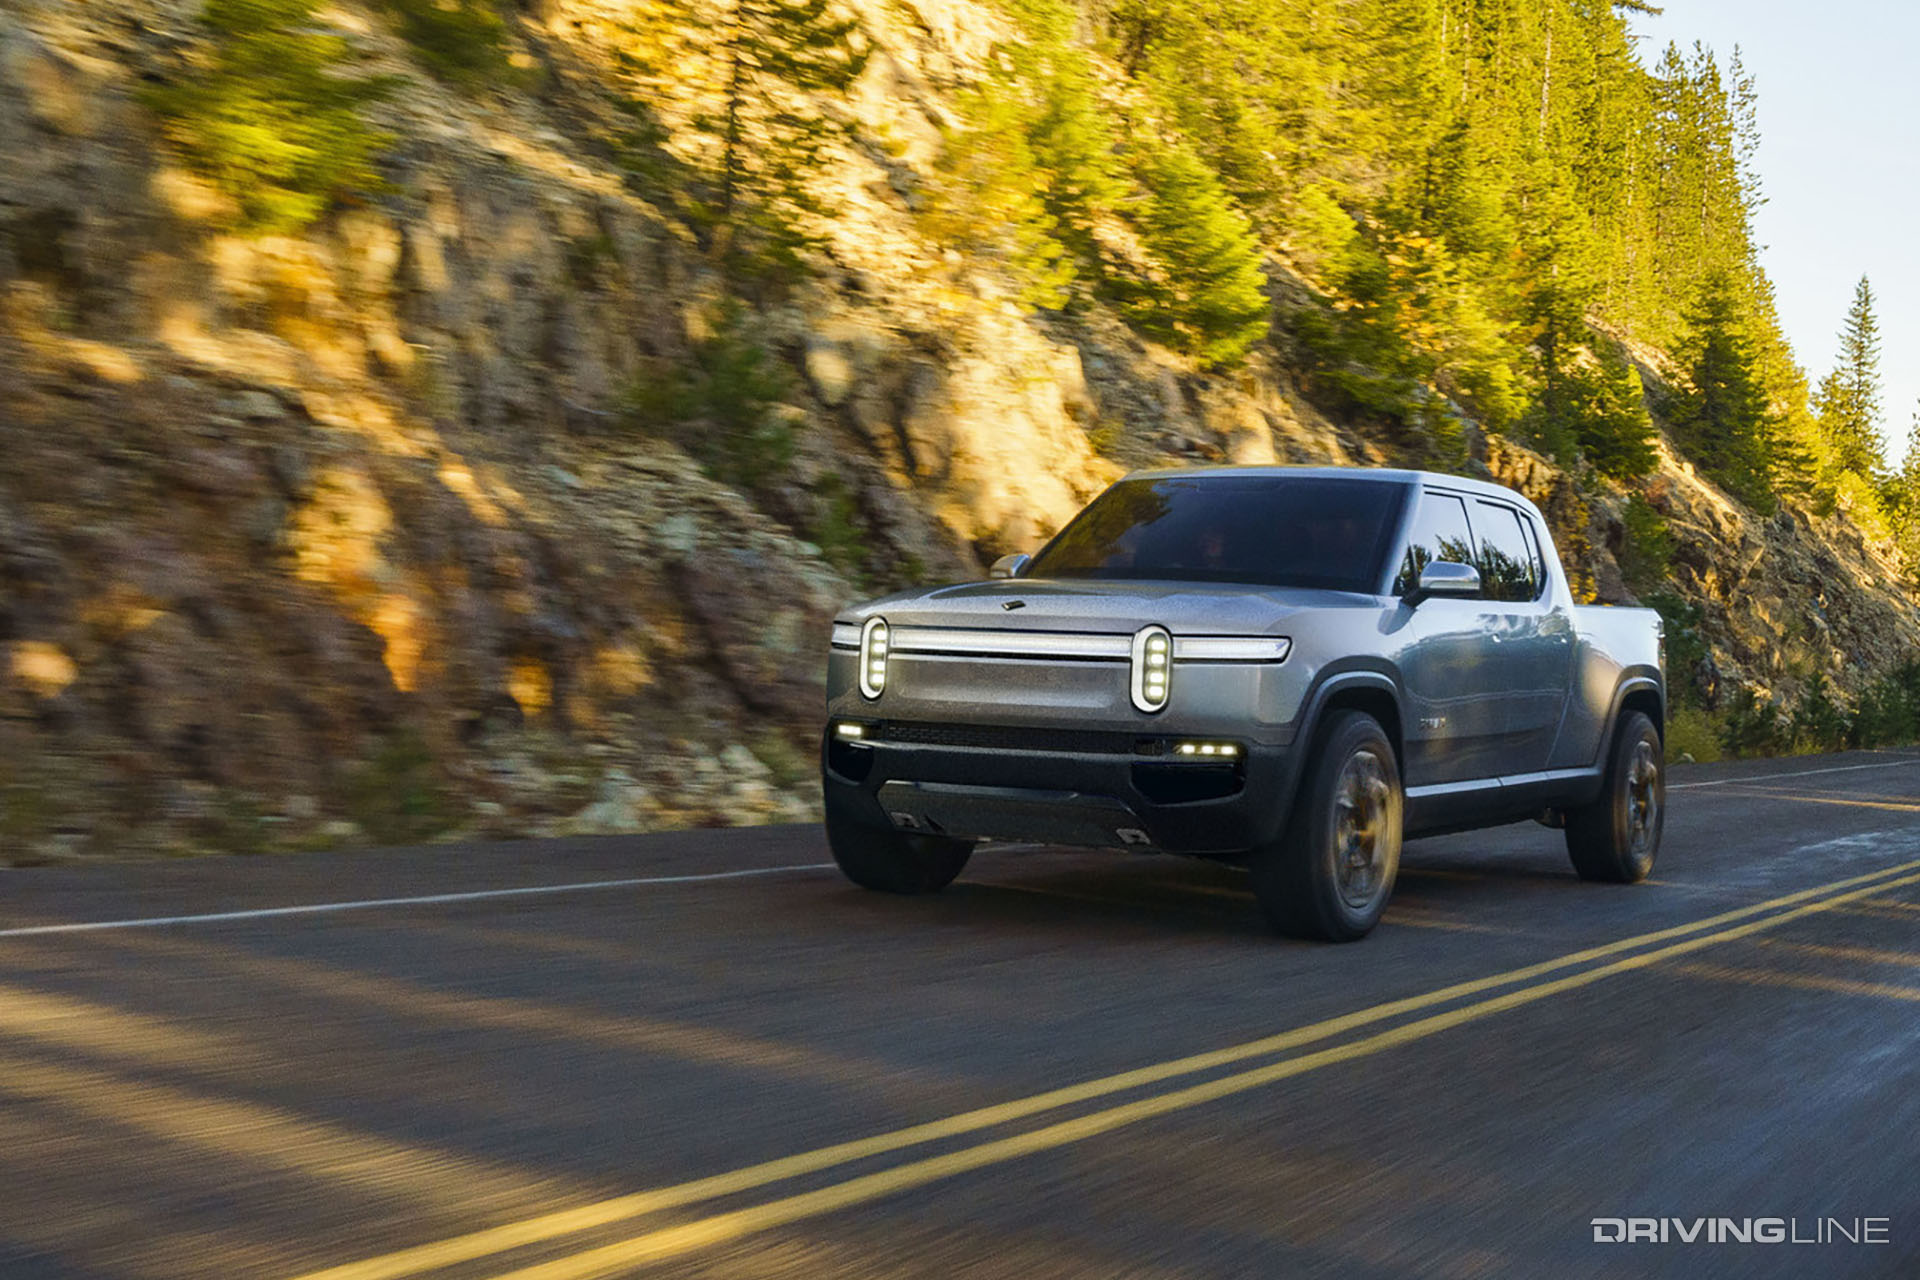 Rivian RT1: The Super Fast, Super Capable Electric Pickup of the Future?   DrivingLine